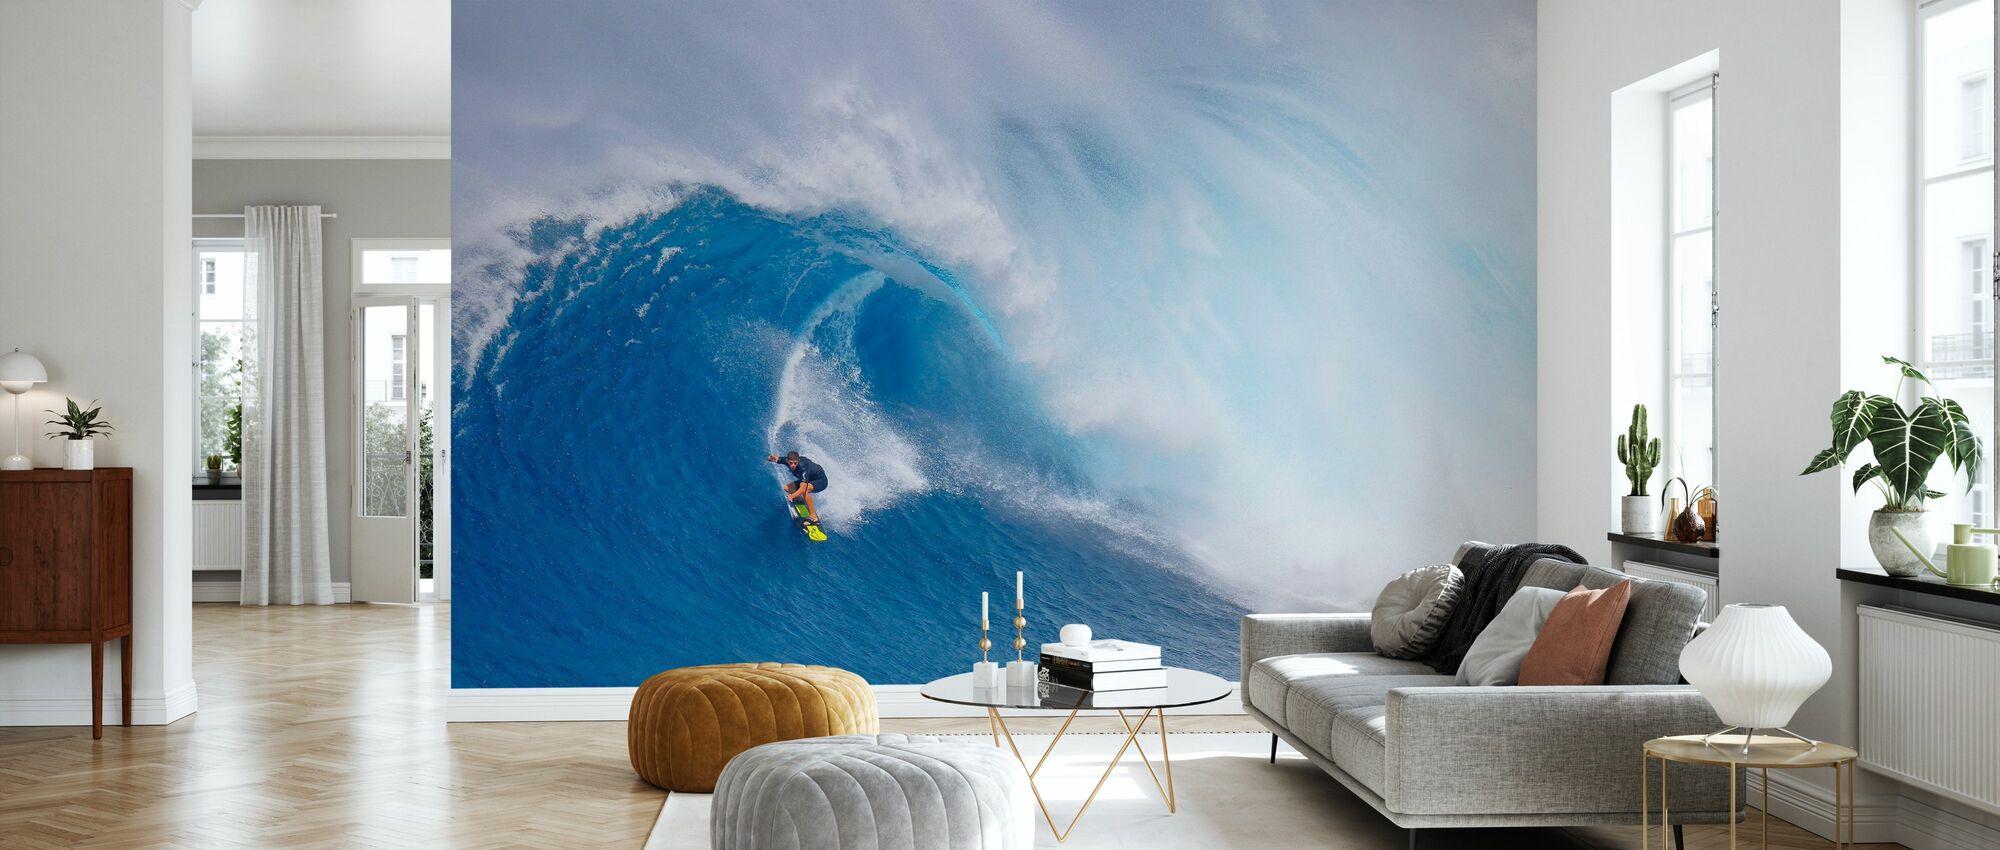 Surfing Jaws - Wallpaper - Living Room